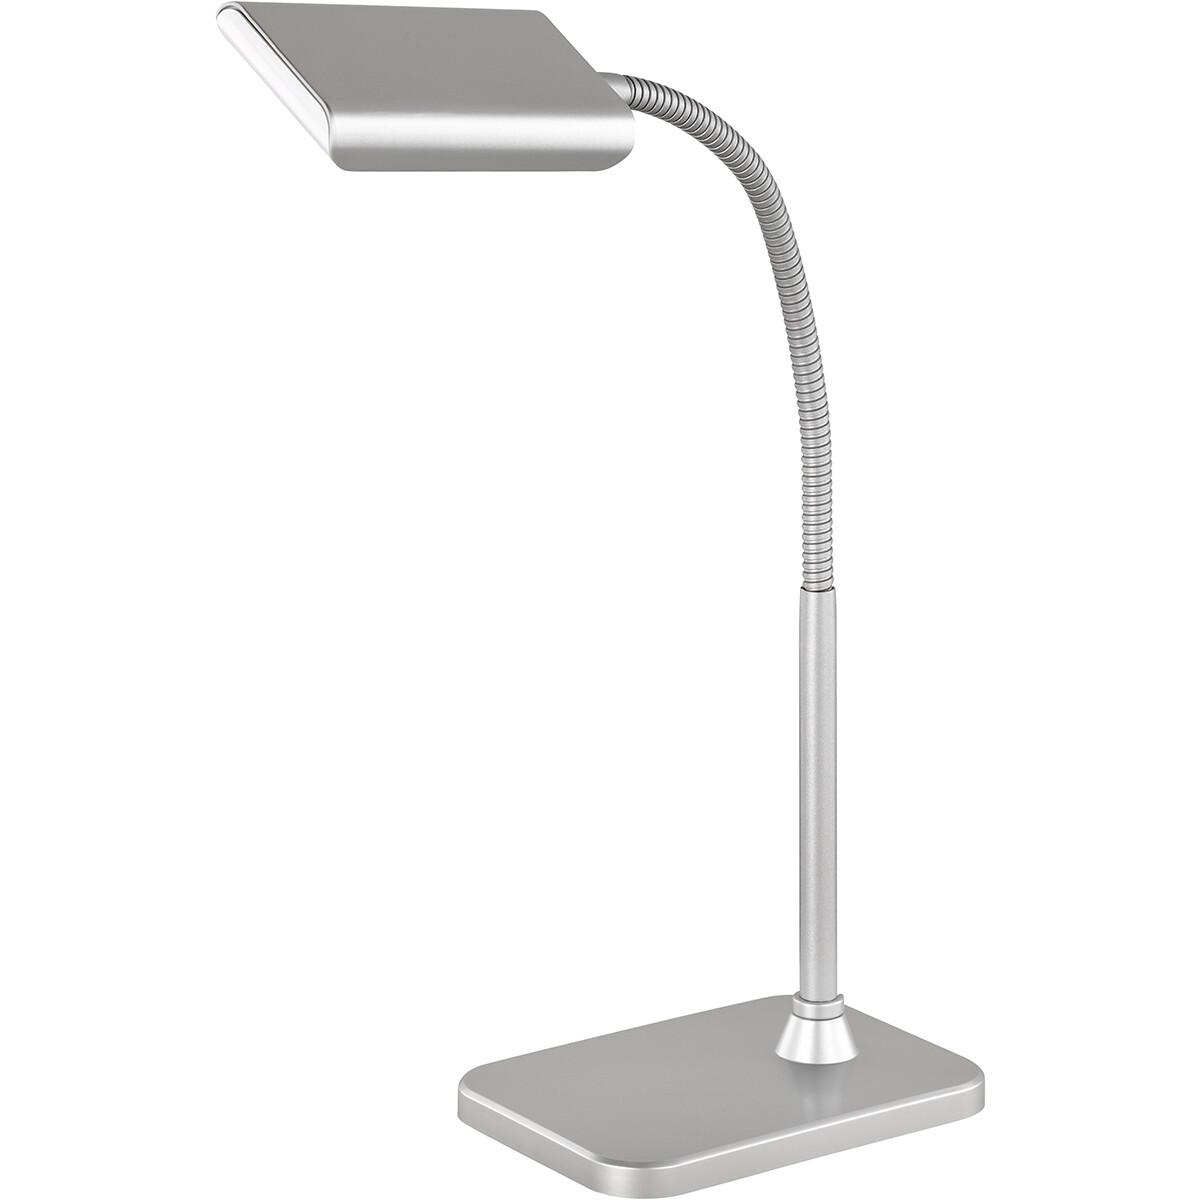 LED Tafellamp - Tafelverlichting - Trion Piko - 3W - Warm Wit 3000K - Rechthoek - Mat Titaan - Aluminium